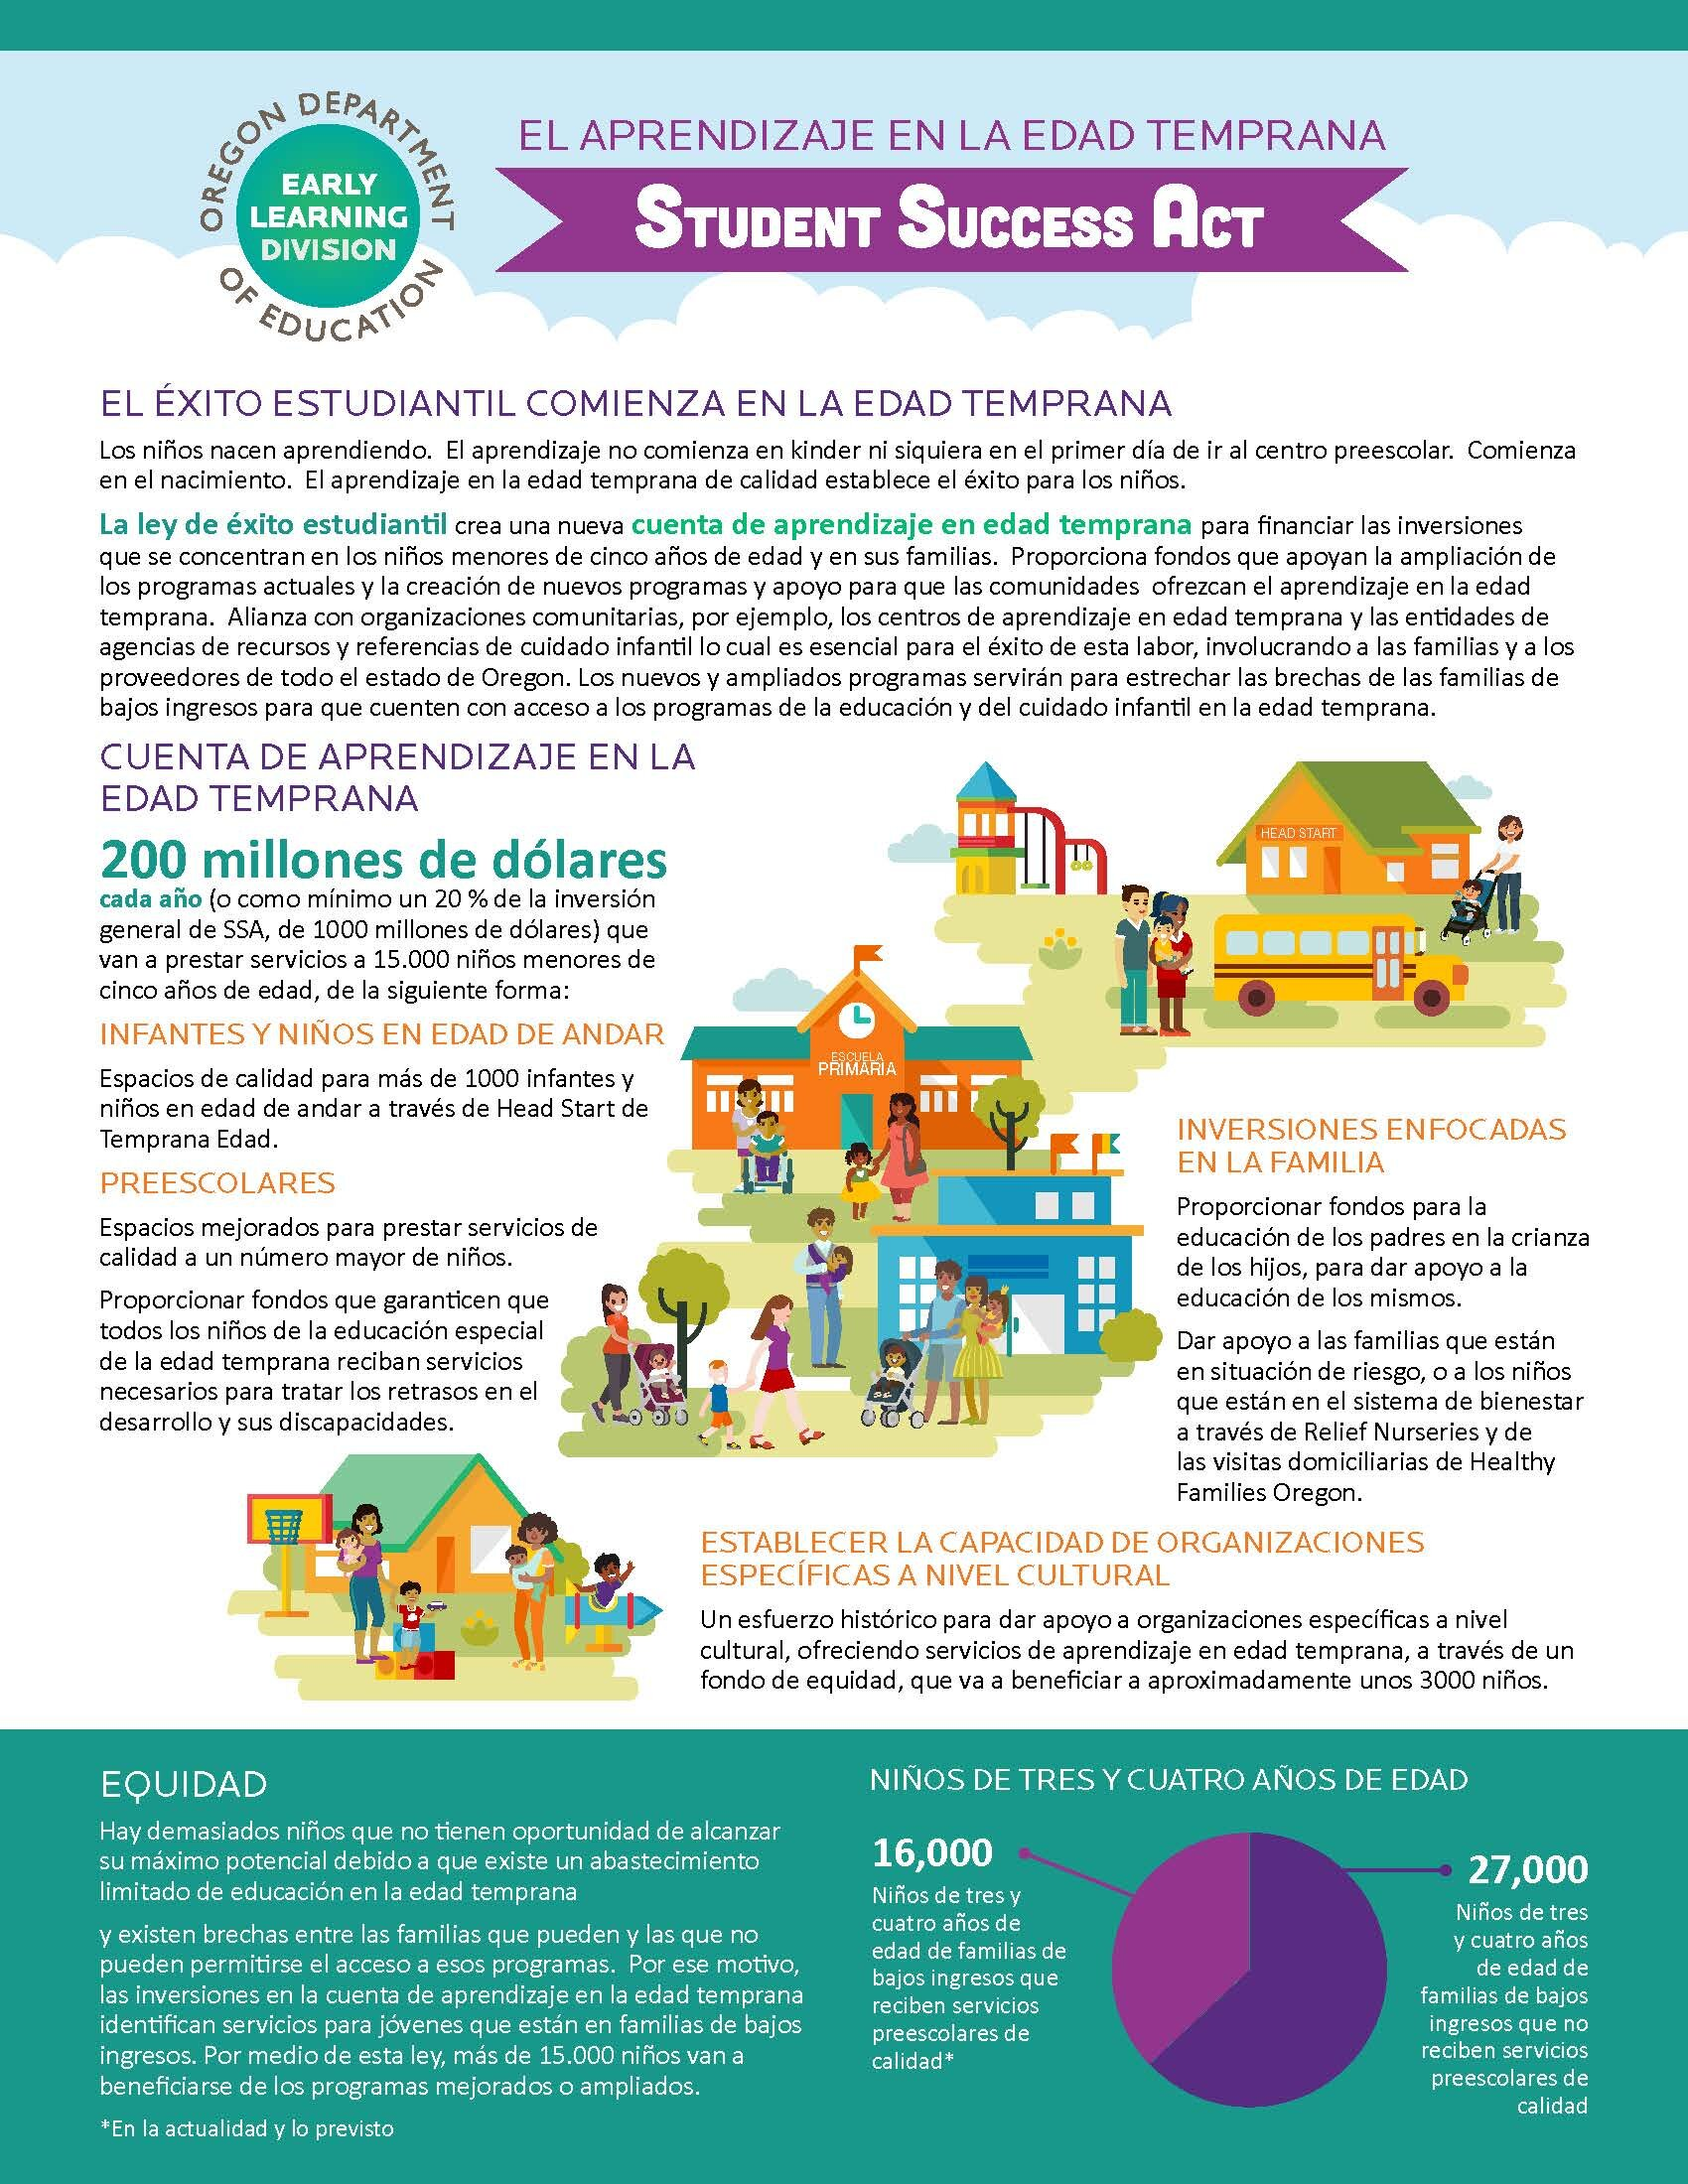 59172_ODE_ELD_SSA Infographic SPANISH_2019 v2 copy_Page_1.jpg